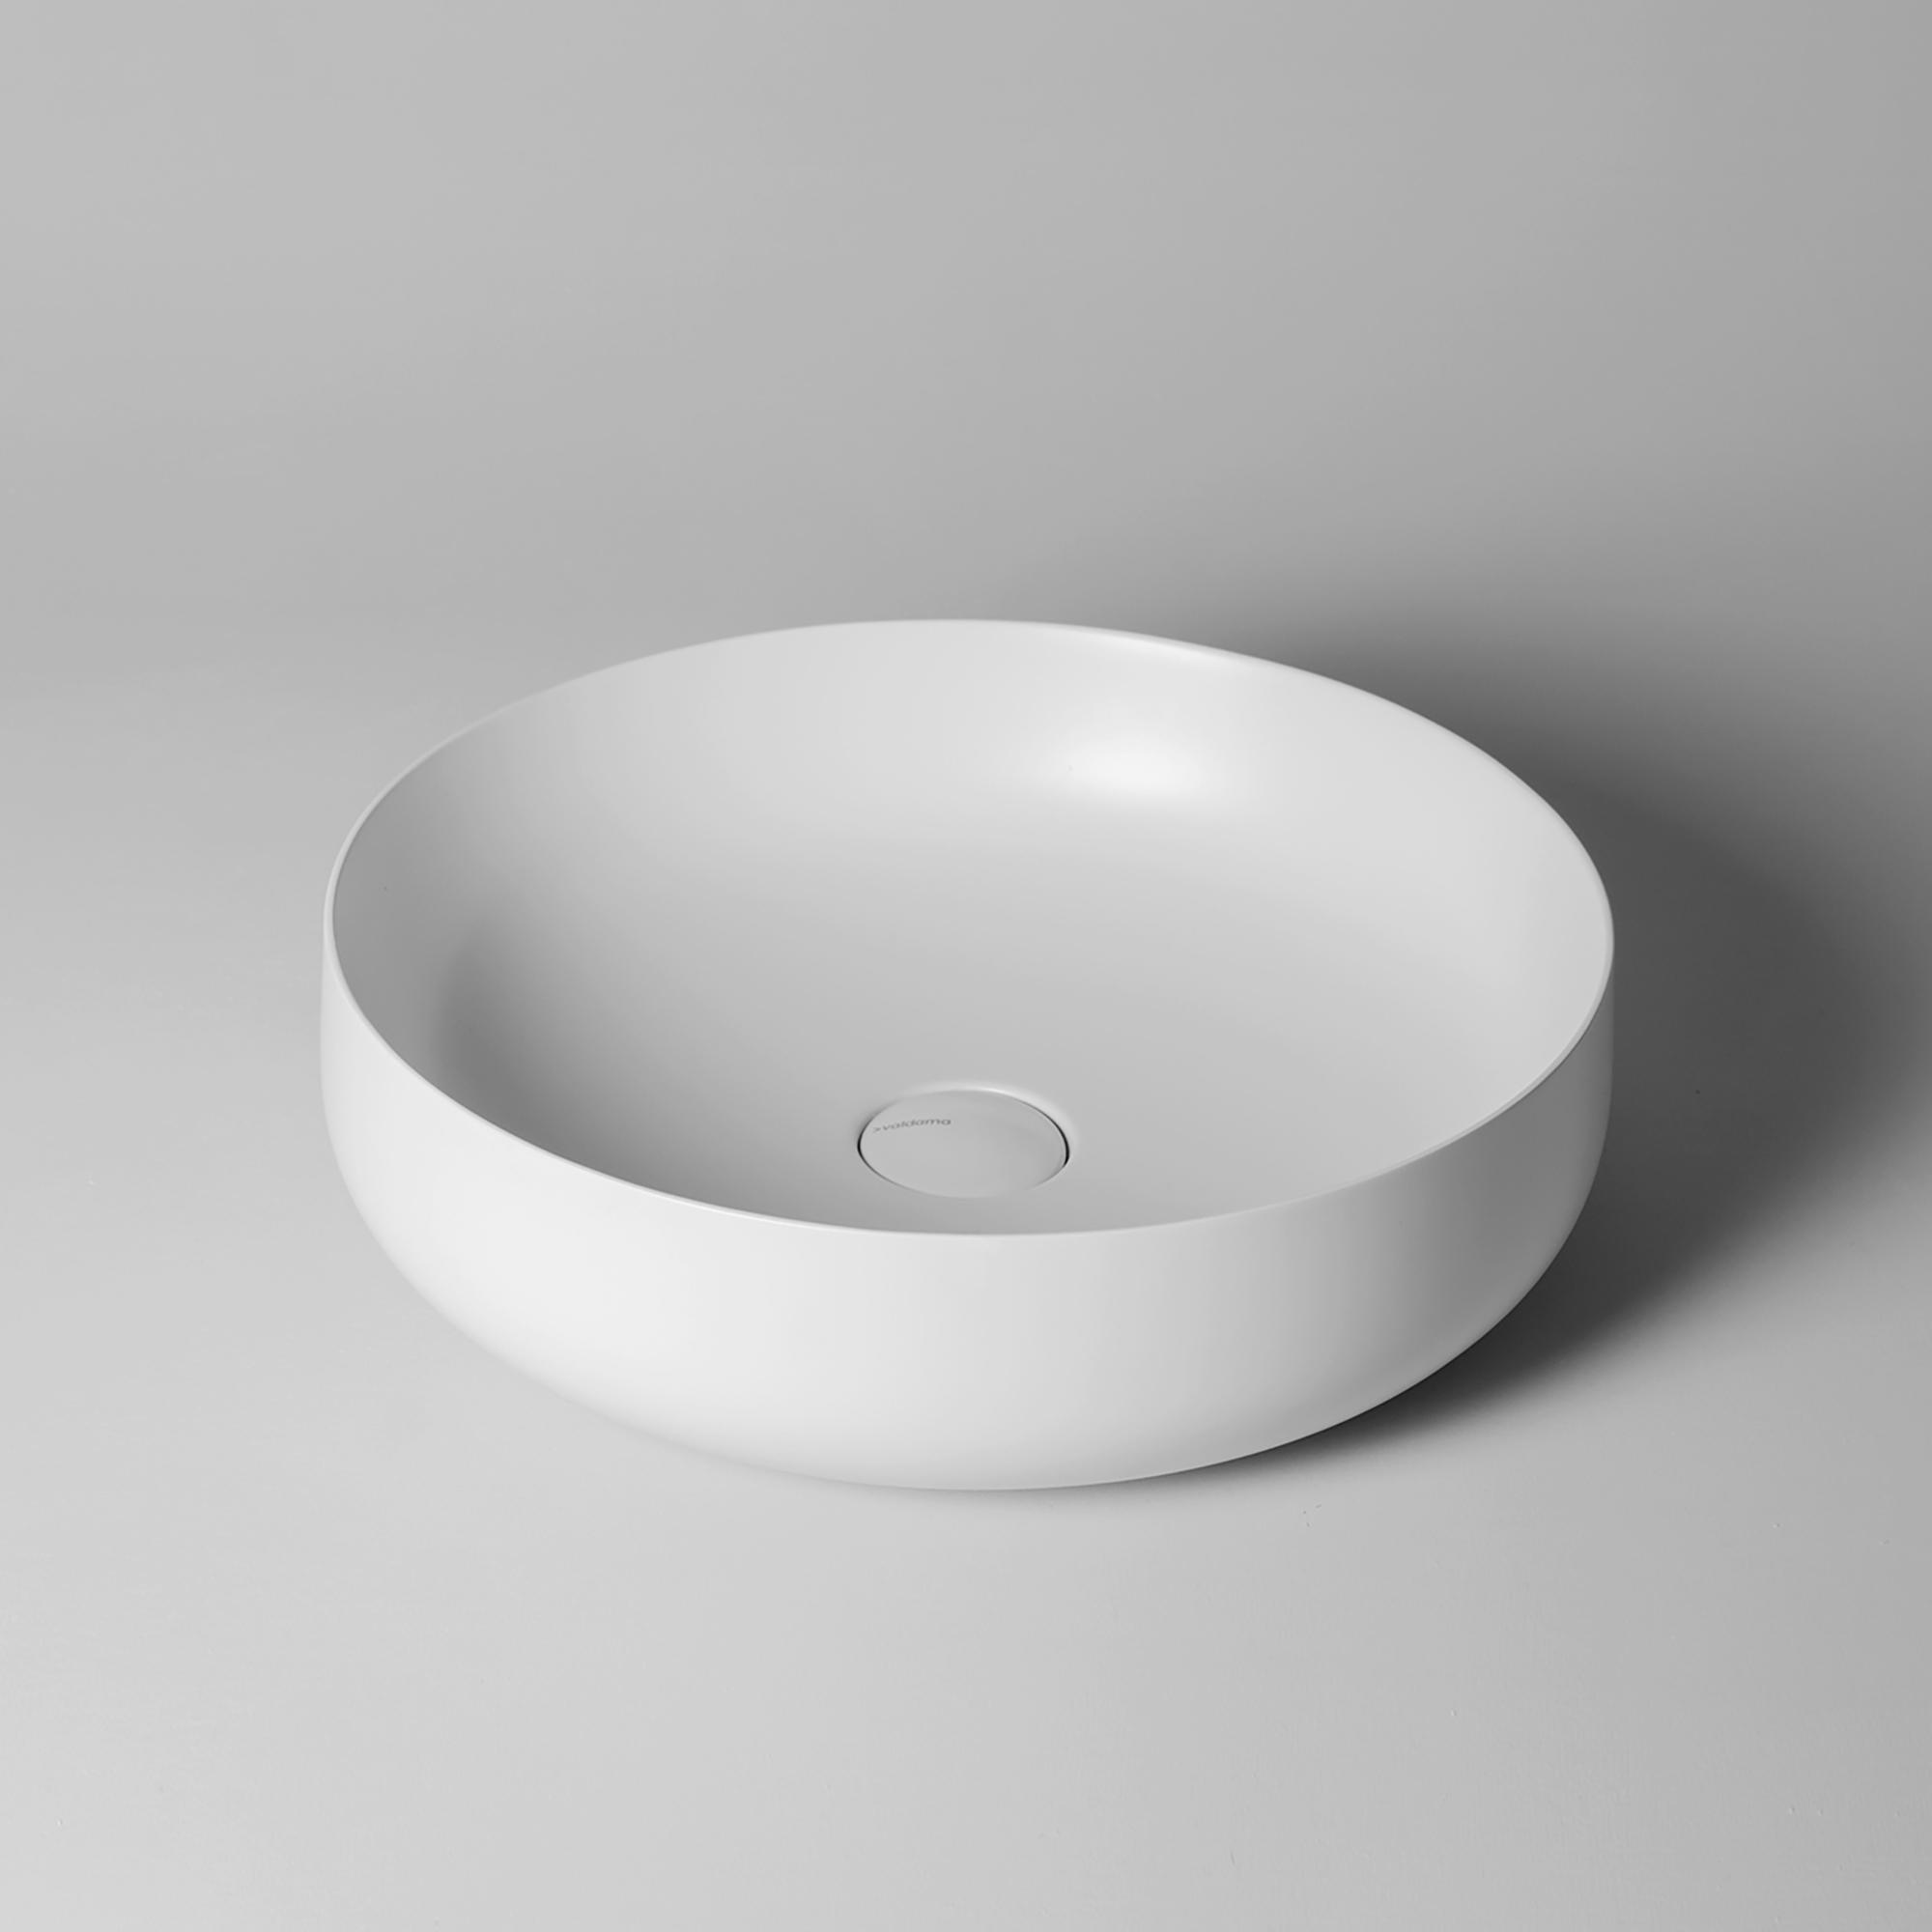 Seed 45R - SEL 08 Bathroom Sink